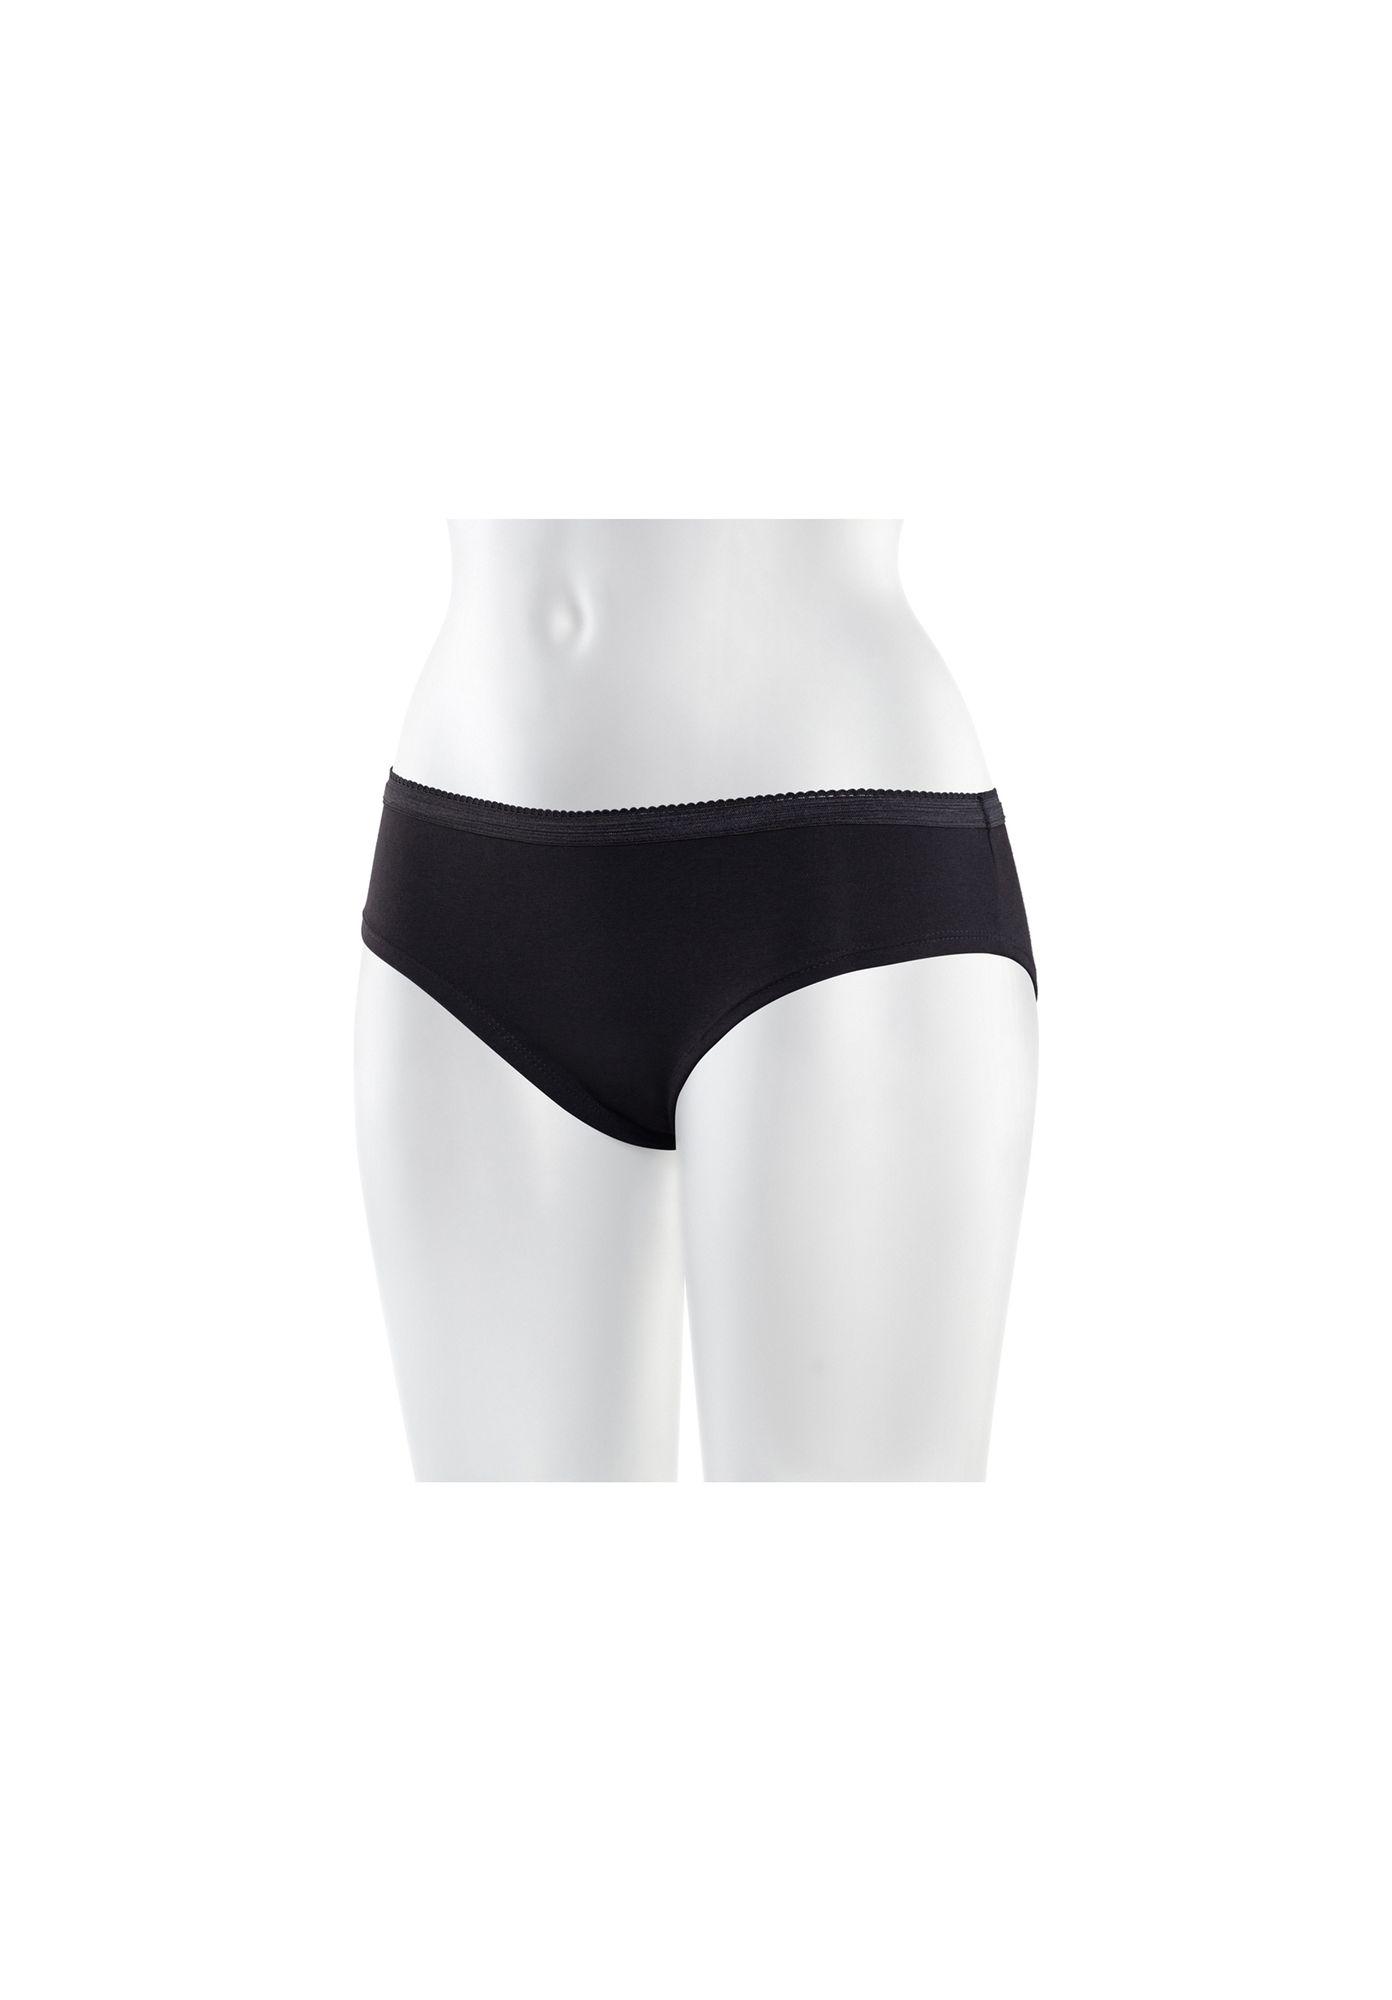 TT21 Panty Lace Band Black